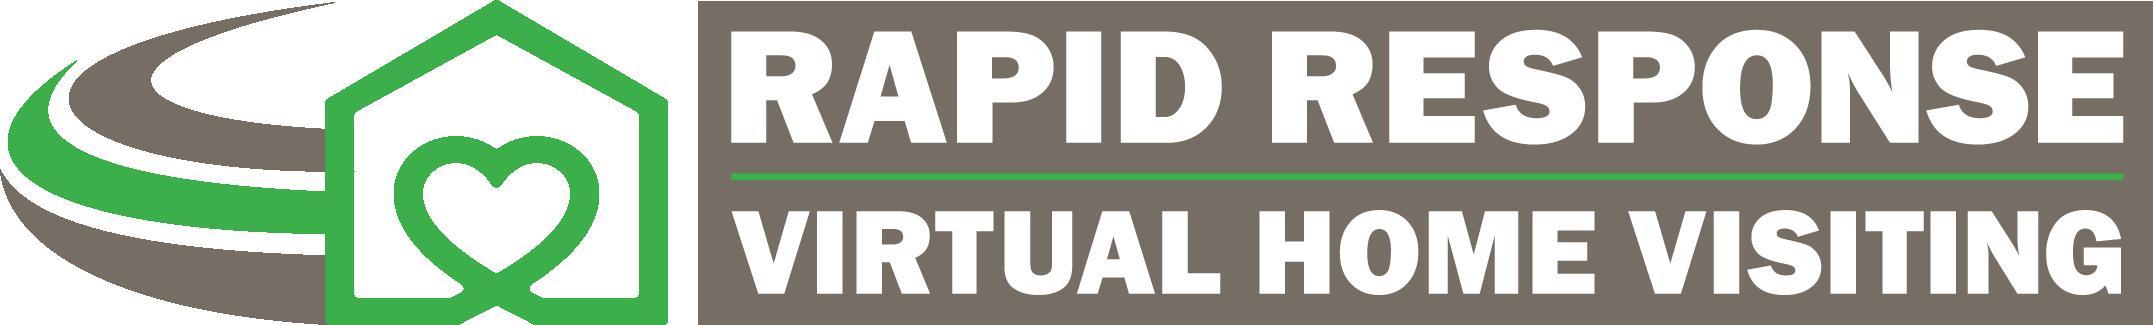 Rapid Response Virtual Home Visiting